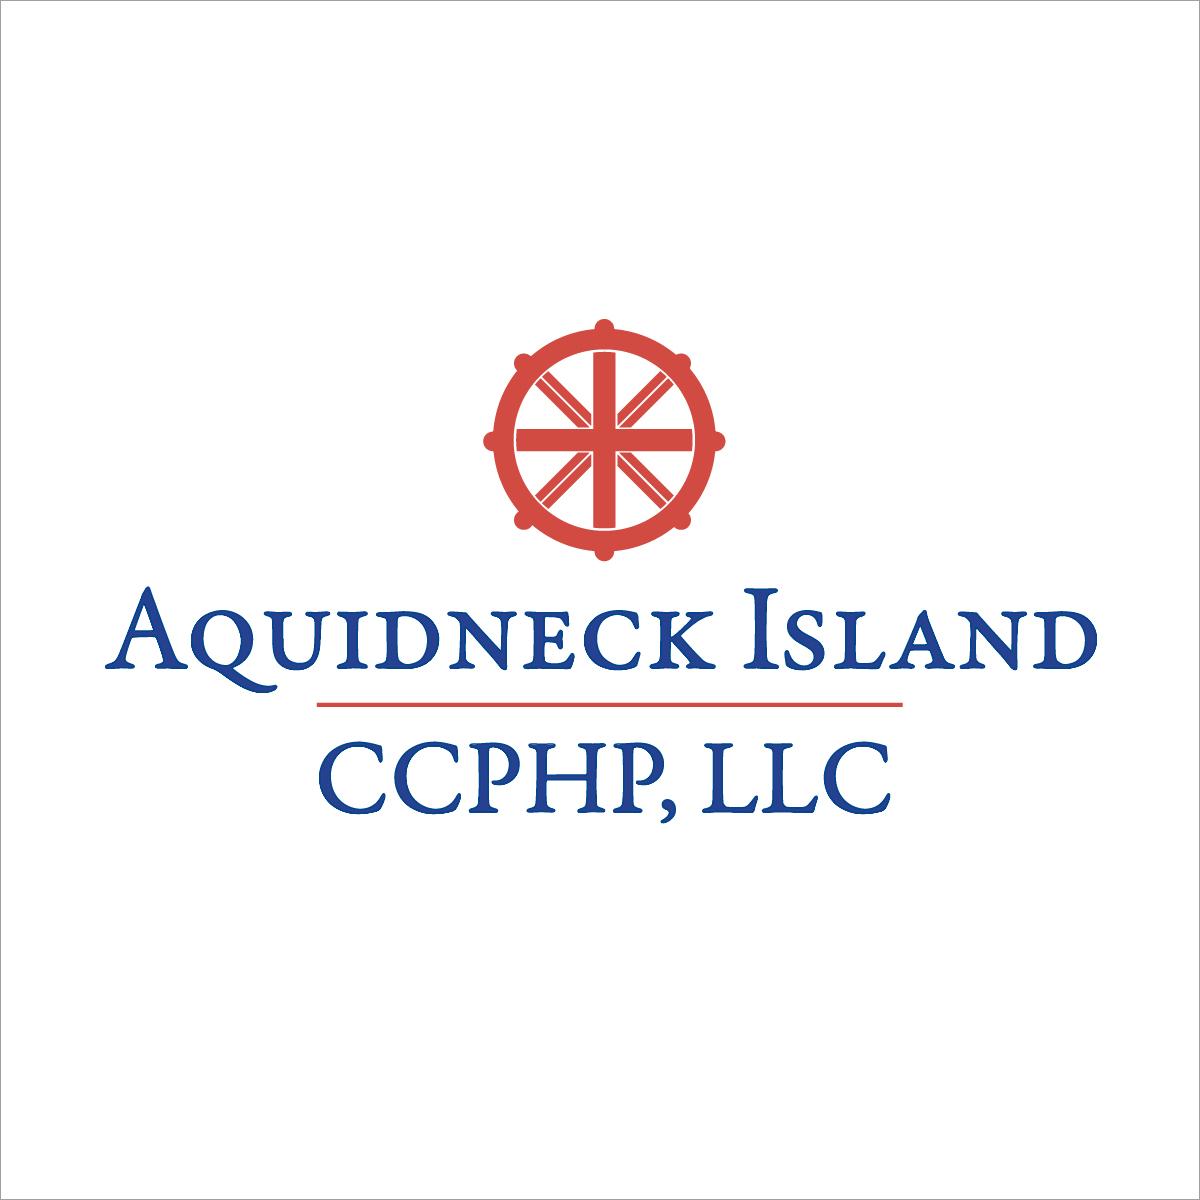 Aquidneck Island CCPHP